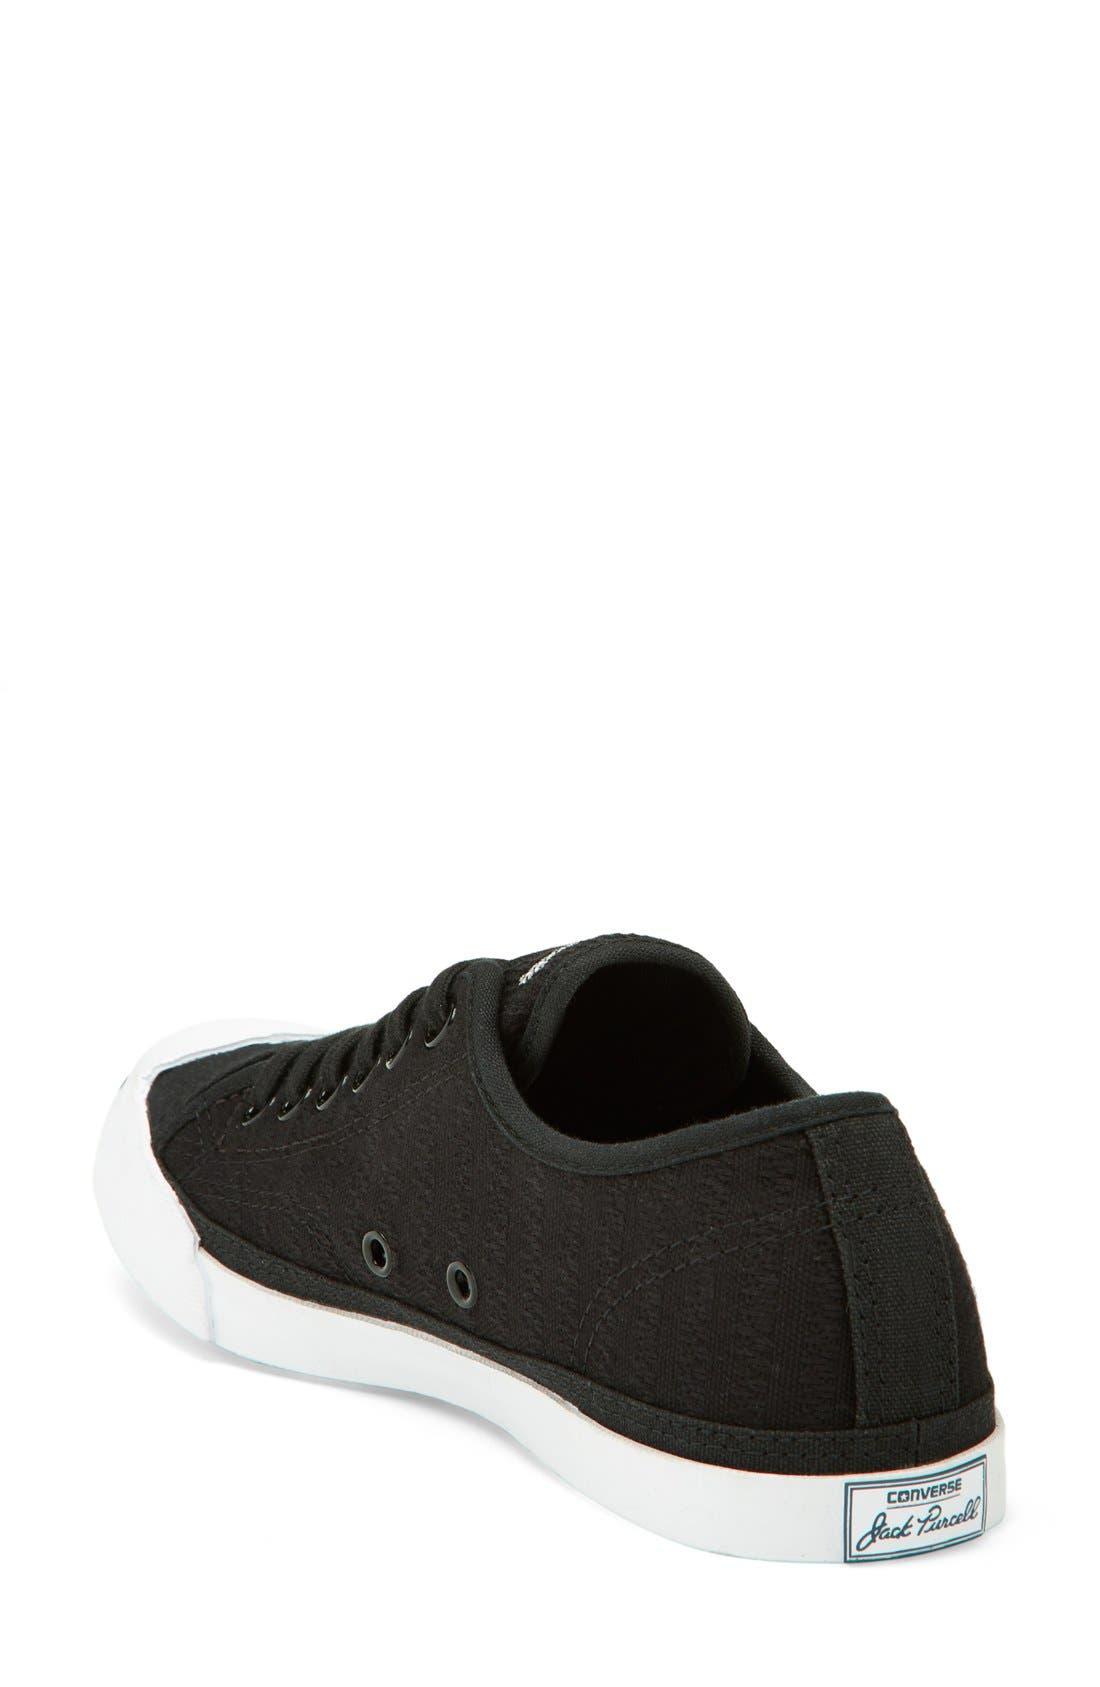 Alternate Image 2  - Converse 'Jack Purcell' Garment Dye Low Top Sneaker (Women) (Nordstrom Exclusive)